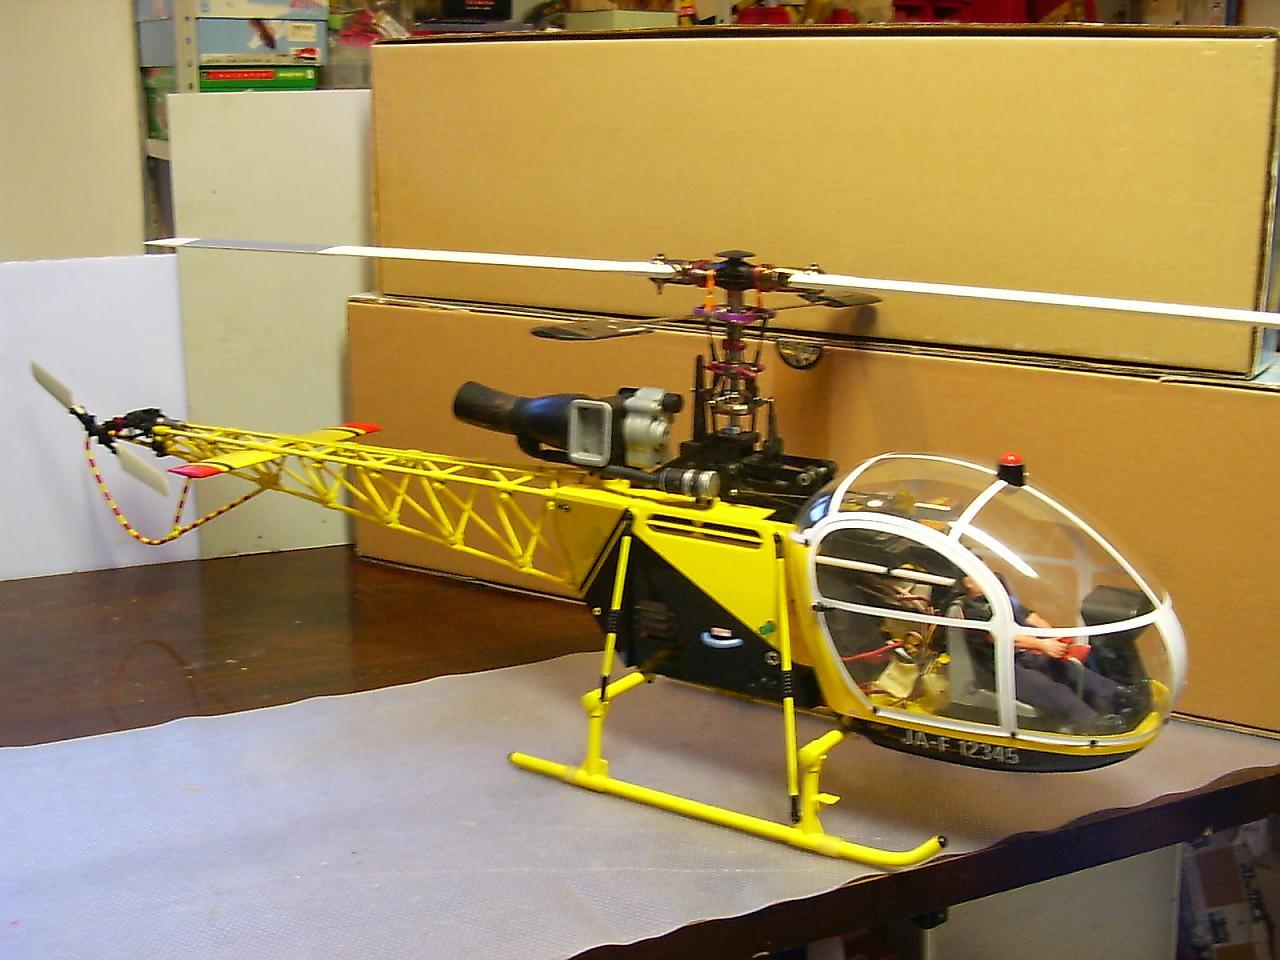 t rex 250 helicopter with 239821 Aerospatiale Sa315b M M Mito Malattia Per Curarla Ci Vuole Il Lama 22 on Index additionally Article6083134 furthermore 261301908711 as well 239821 Aerospatiale Sa315b M M Mito Malattia Per Curarla Ci Vuole Il Lama 22 likewise Showthread.